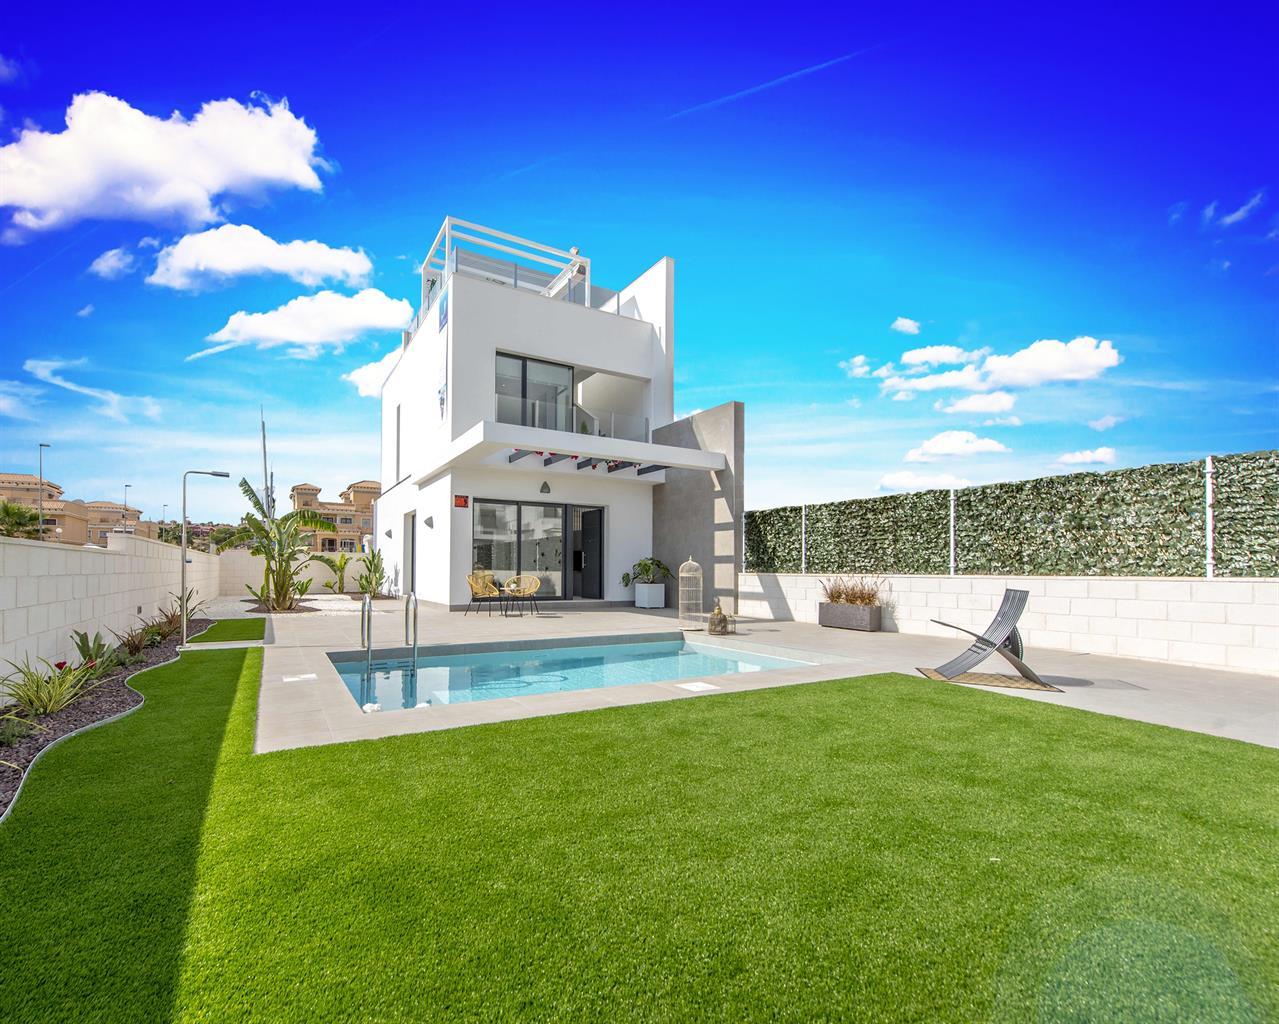 Maison - Villamartin - #4227904-0